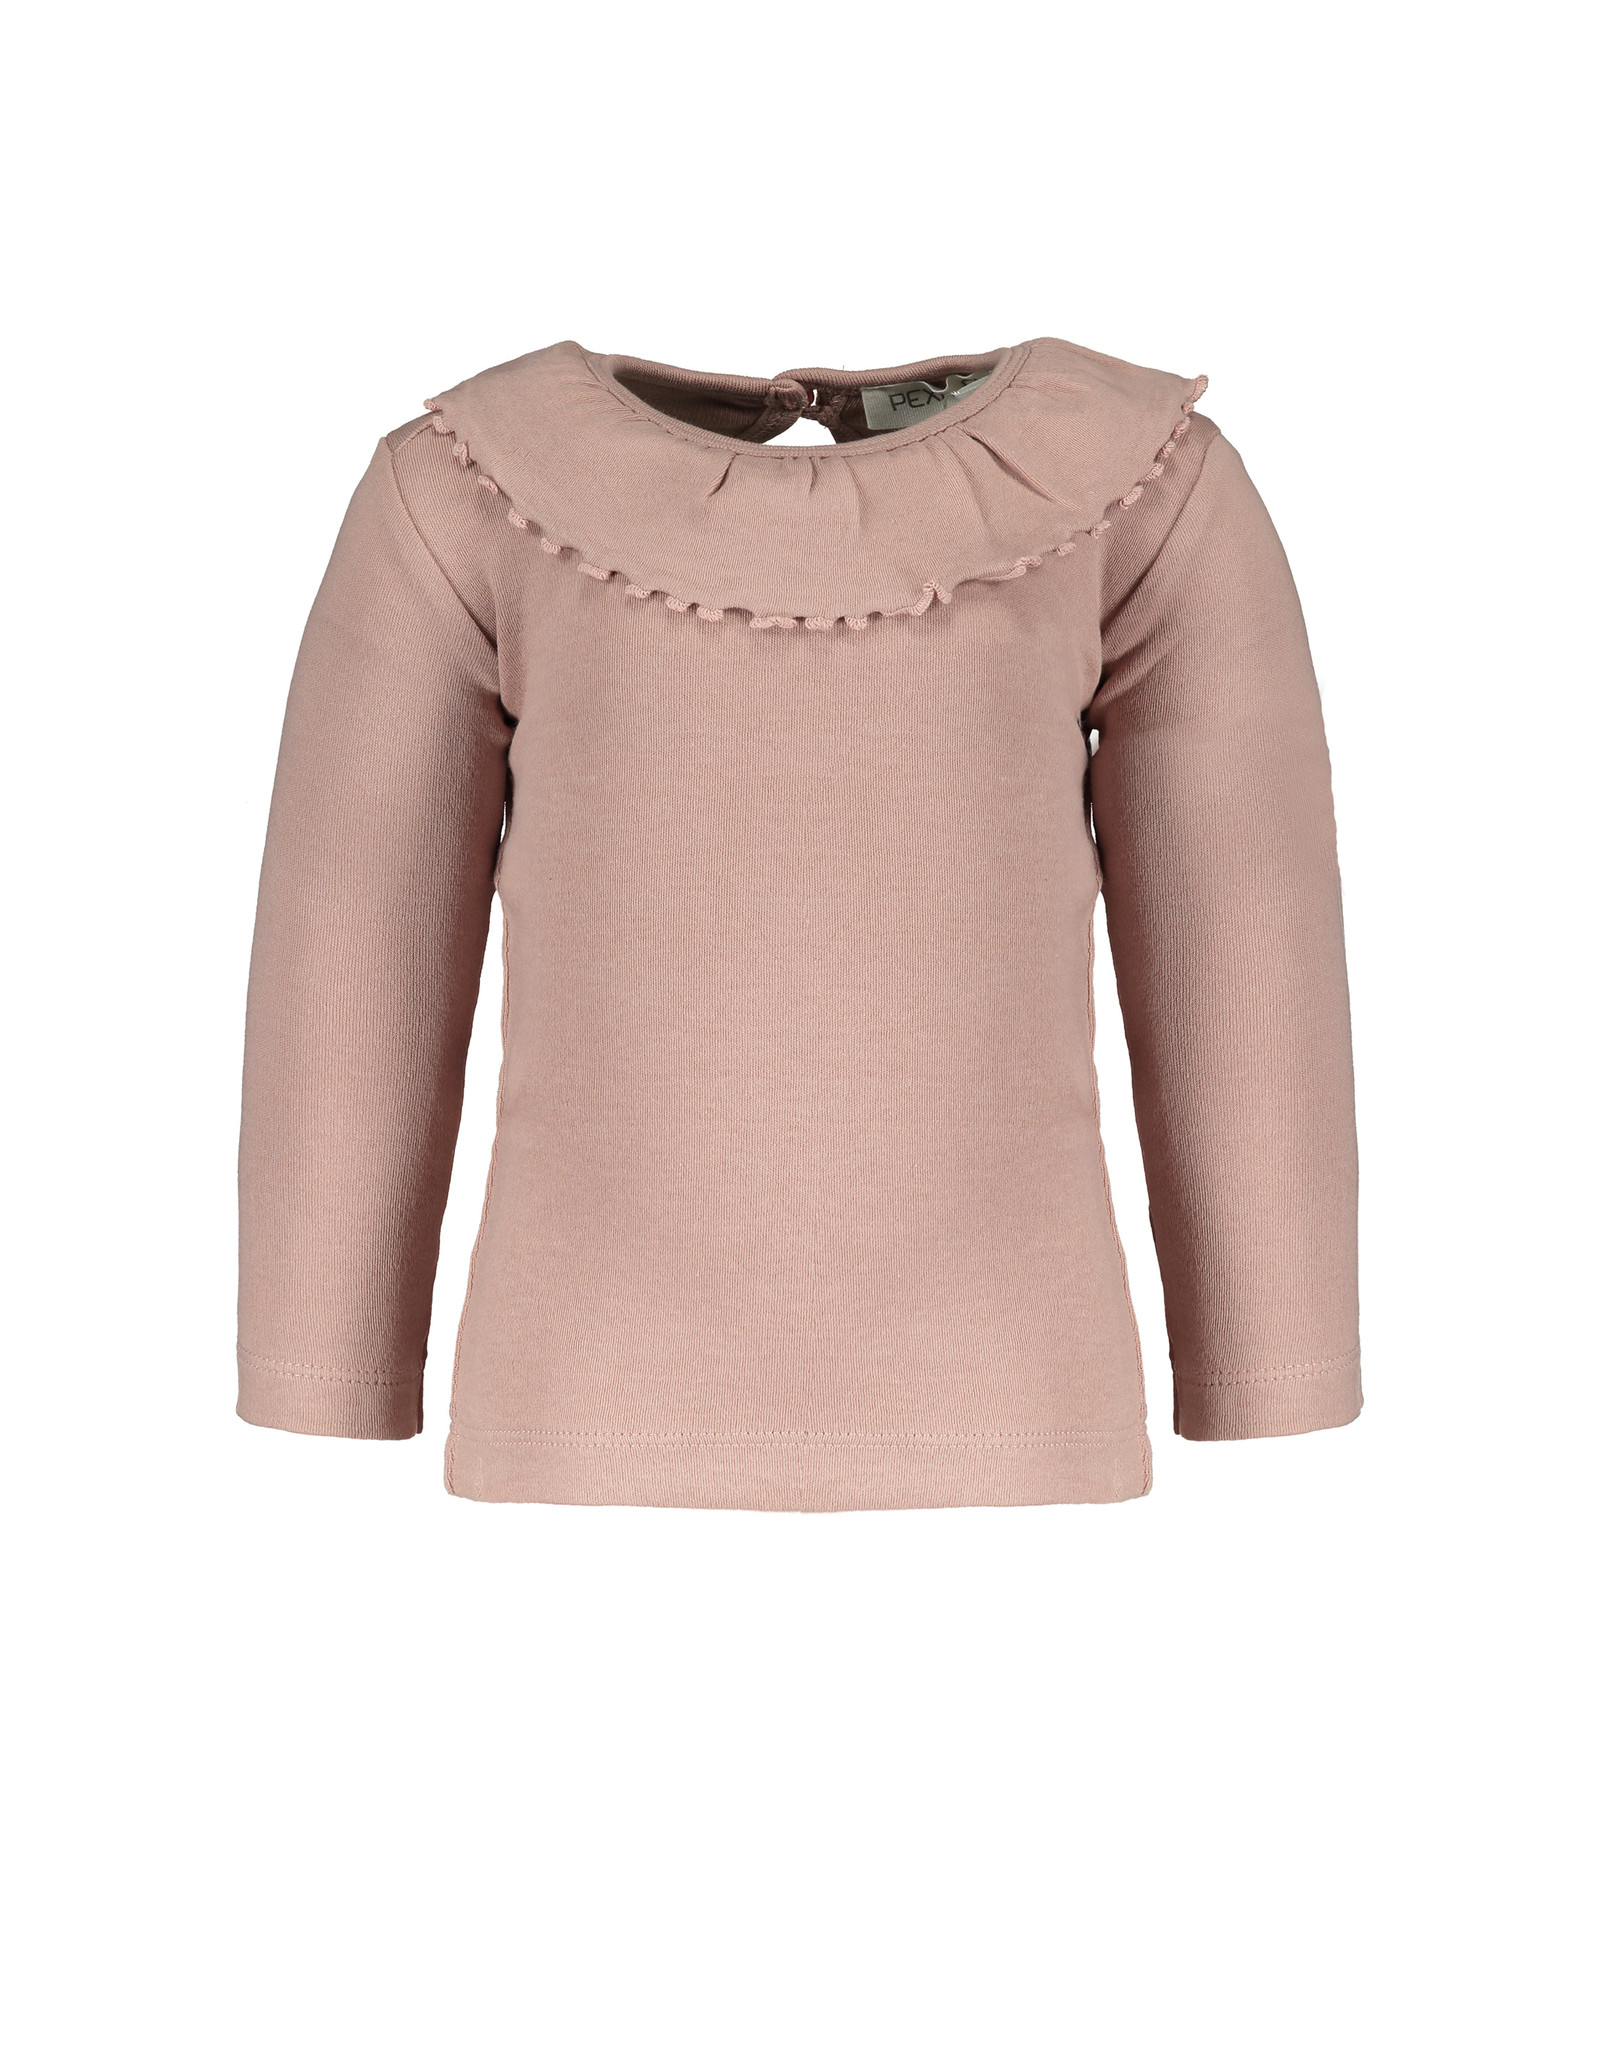 Pexi Lexi Shirt LS Ruffle - Dusty Rose